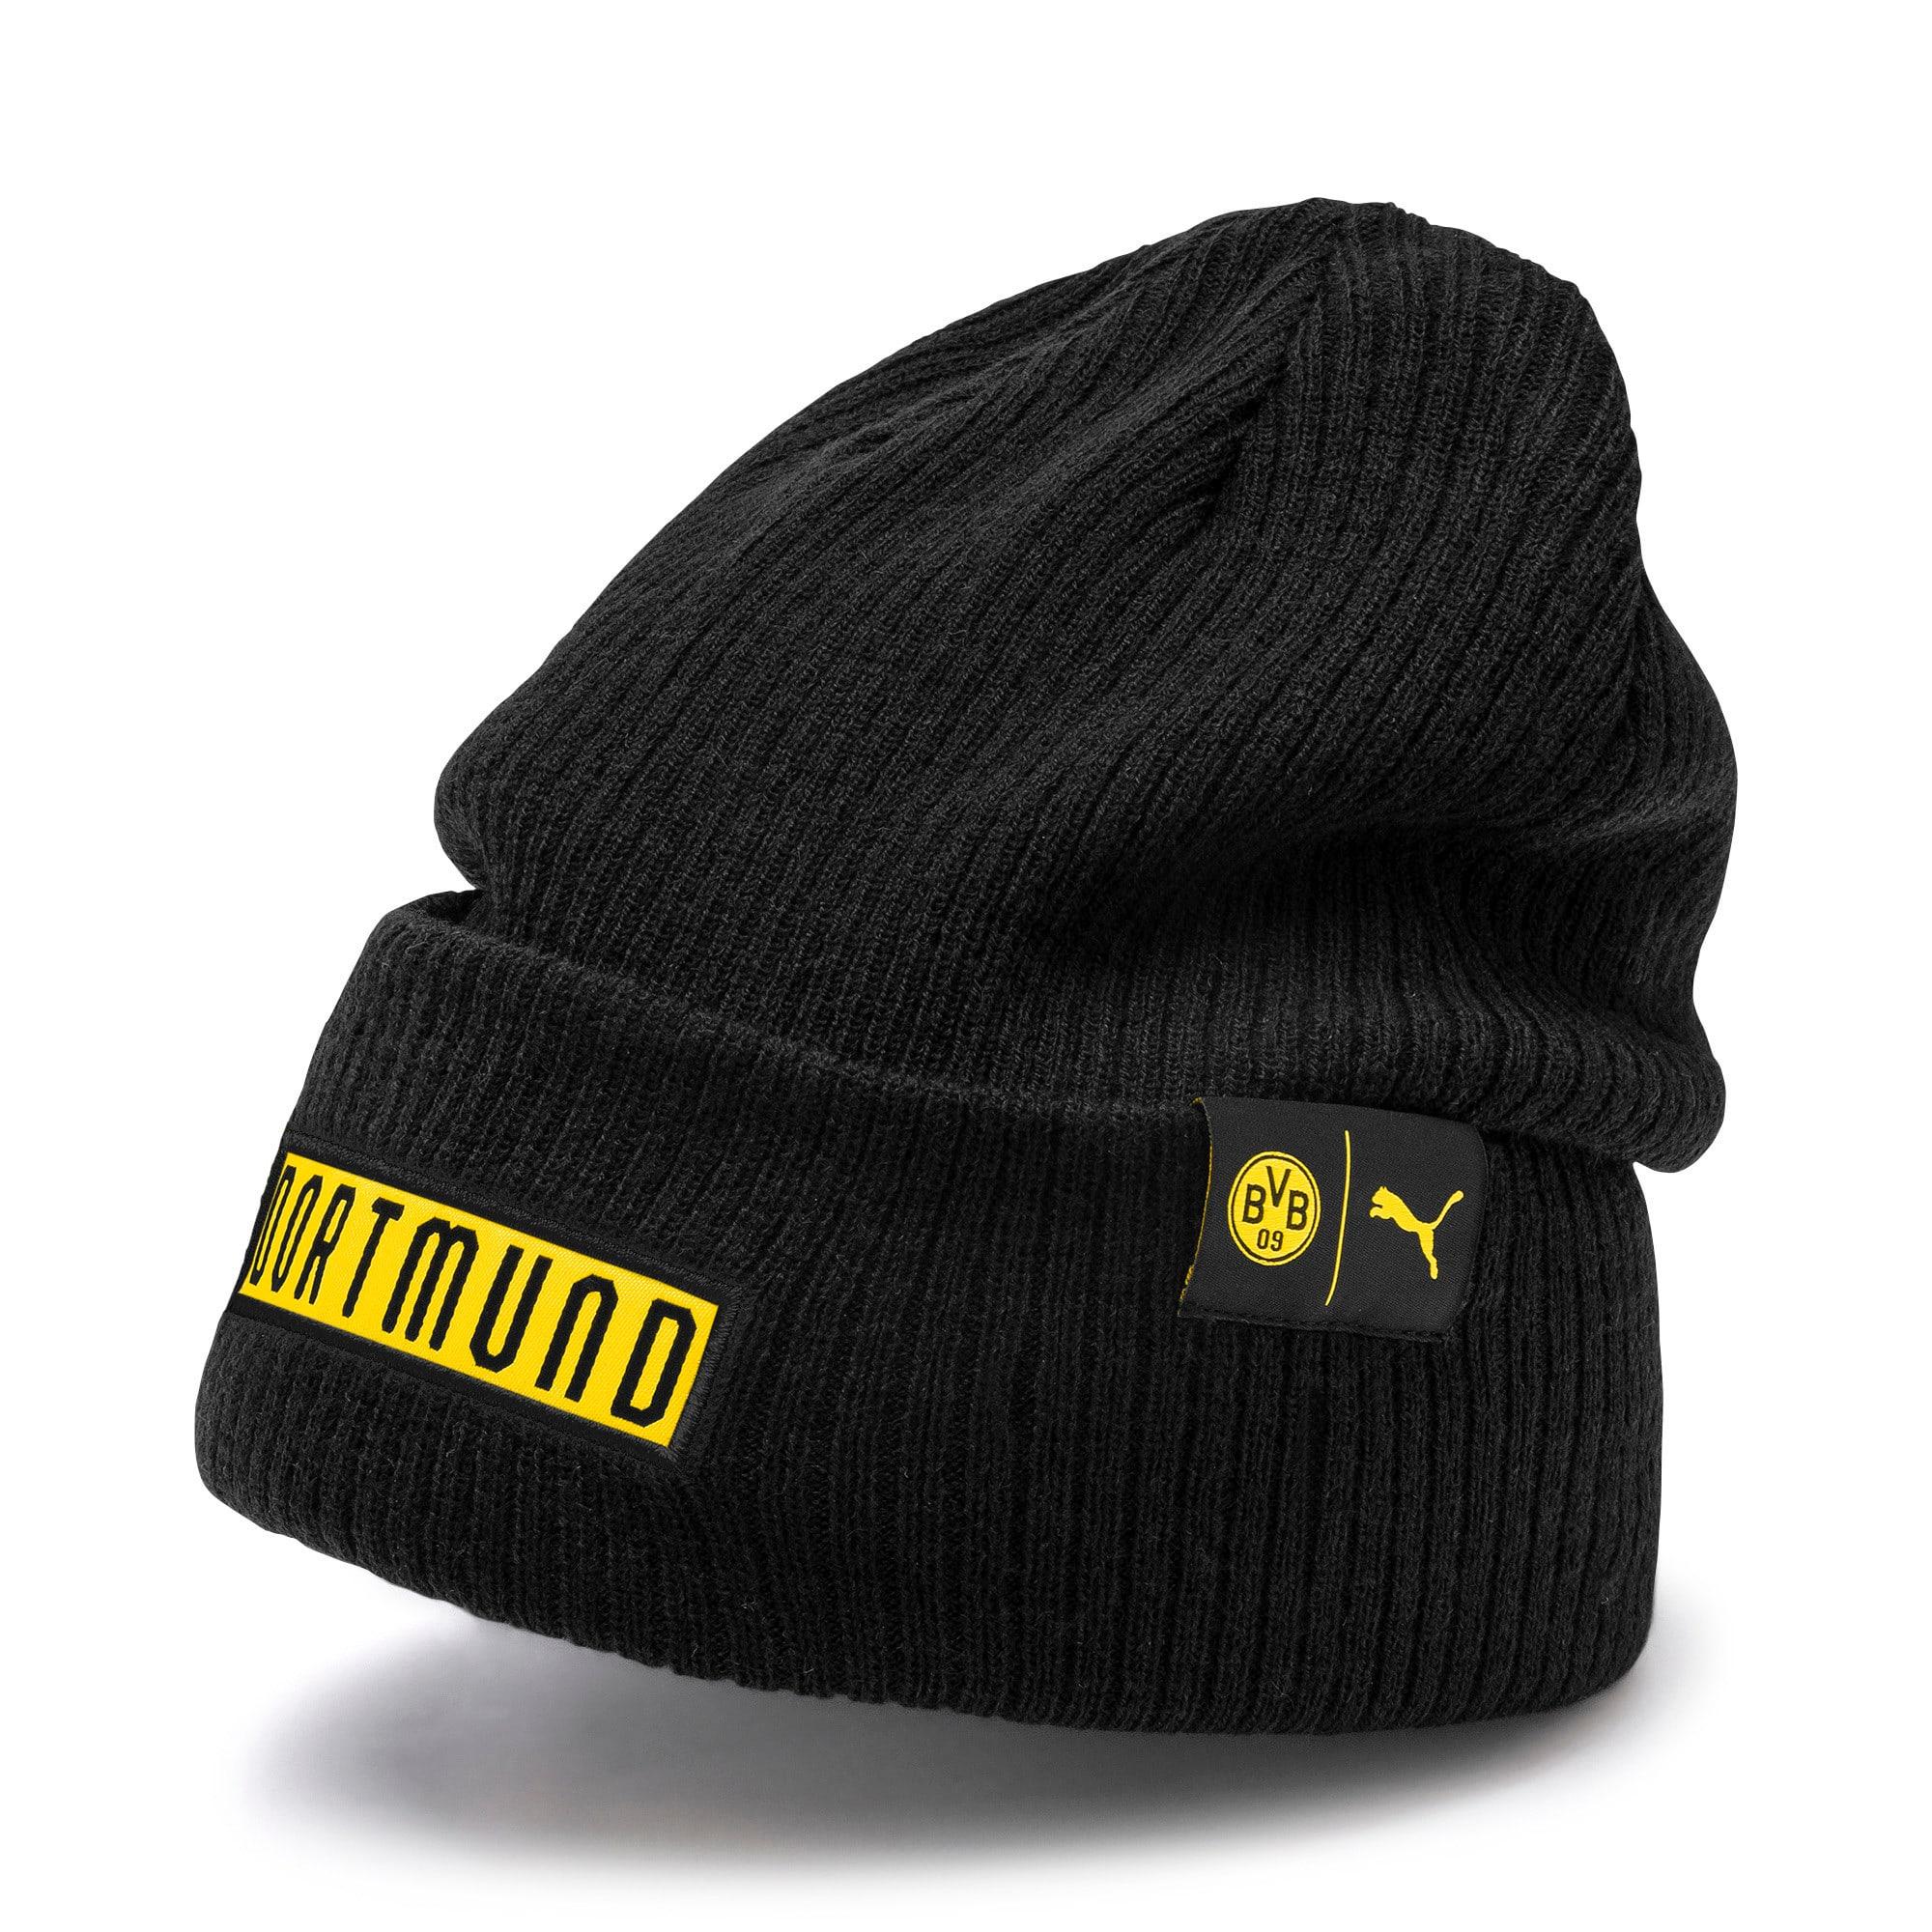 Thumbnail 1 of BVB Football Culture Bronx Beanie, Puma Black-Cyber Yellow, medium